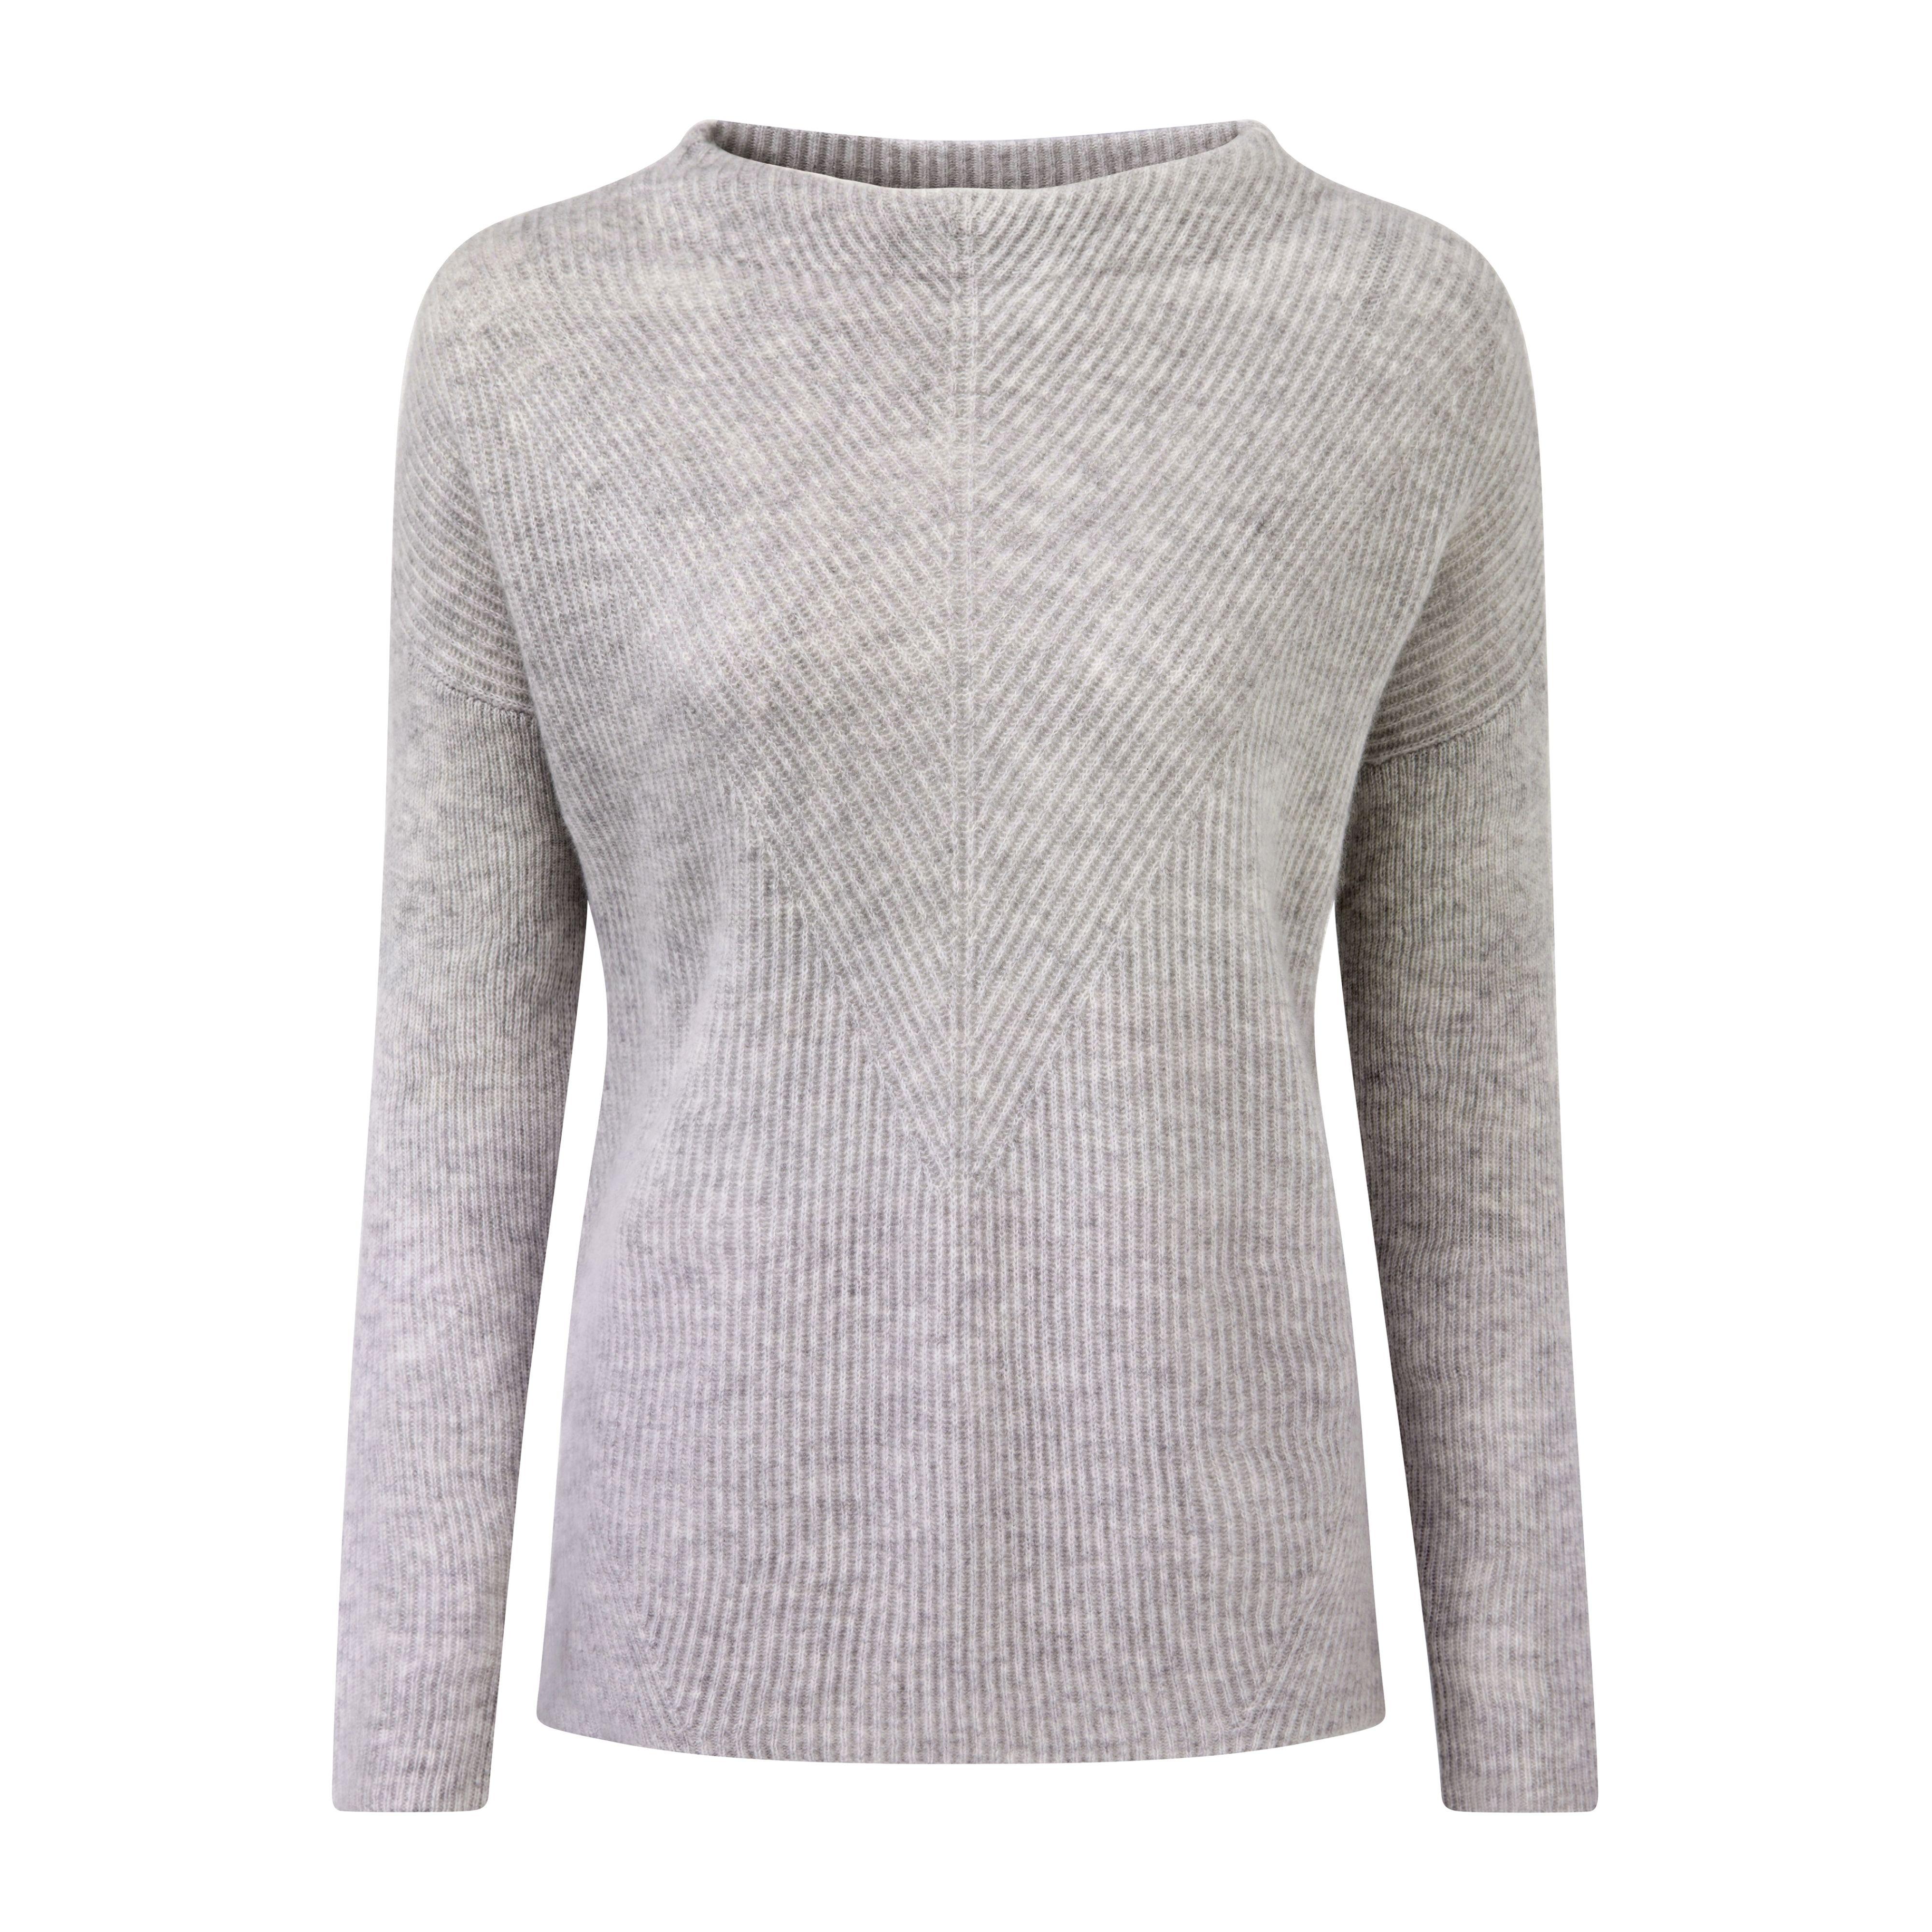 Gassato Cashmere Bardot Sweater | Sweaters & Jumpers | Pure ...